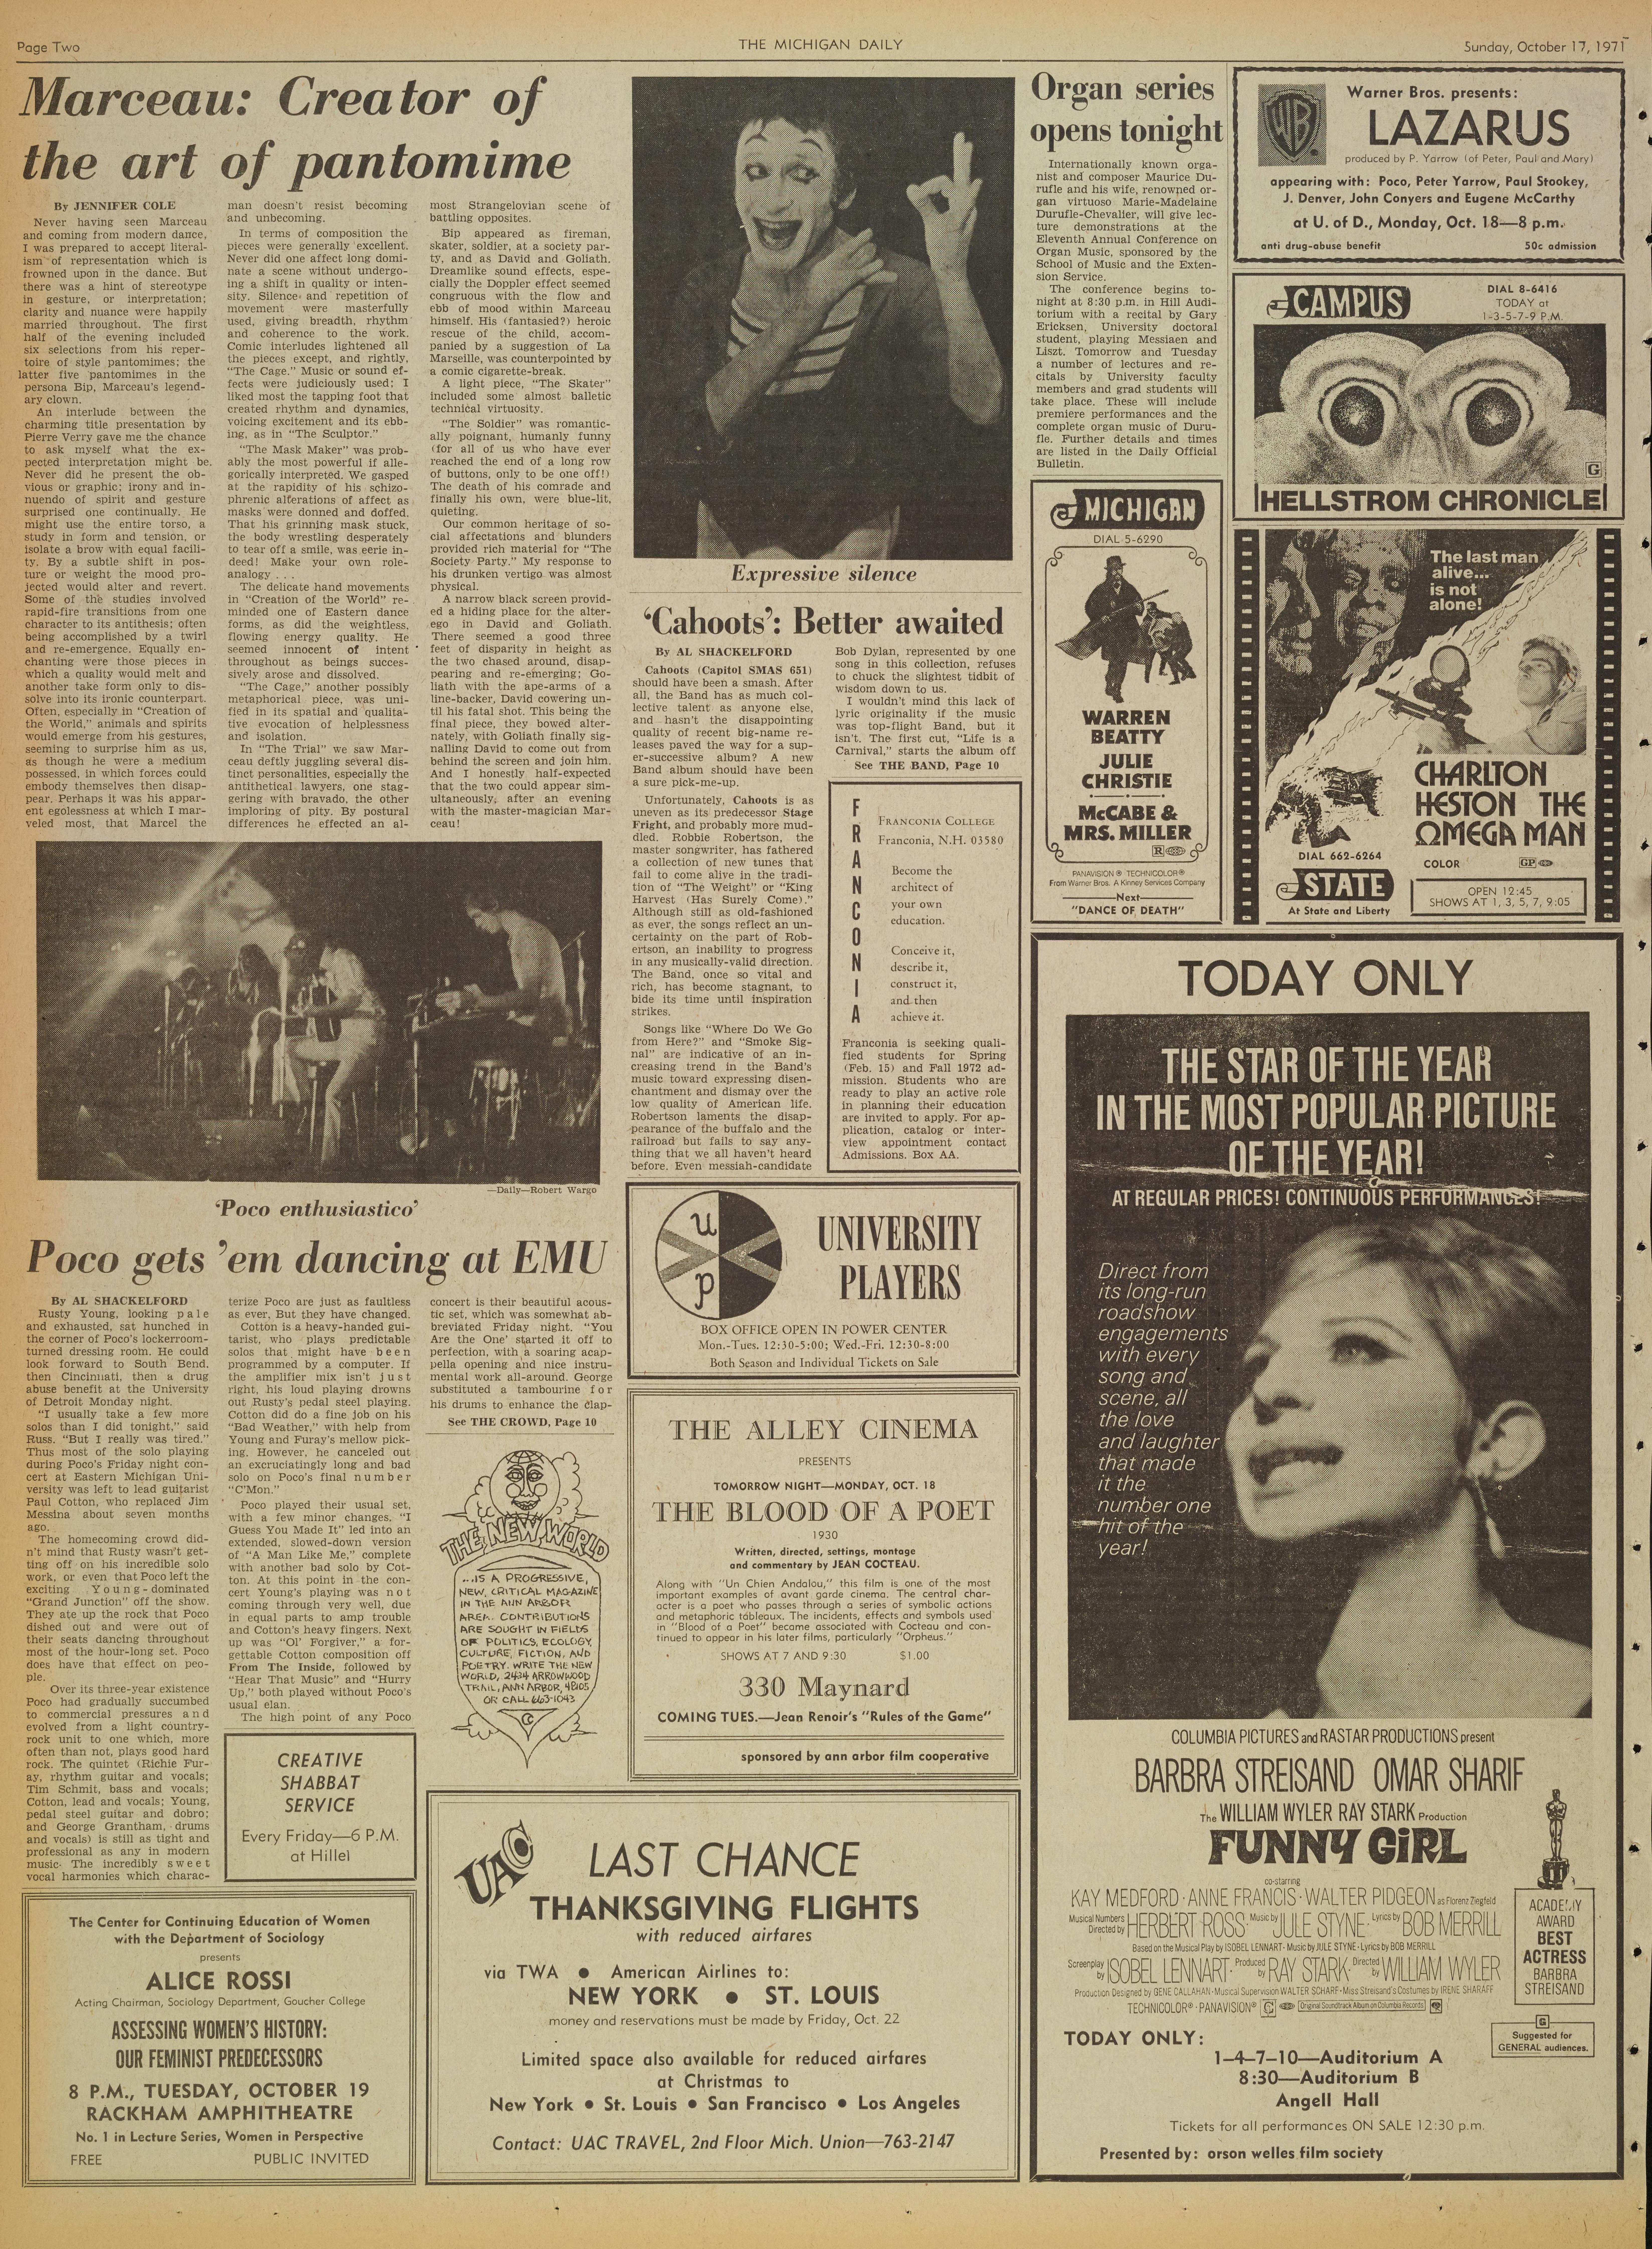 Michigan Daily Digital Archives - October 17, 1971 (vol  82